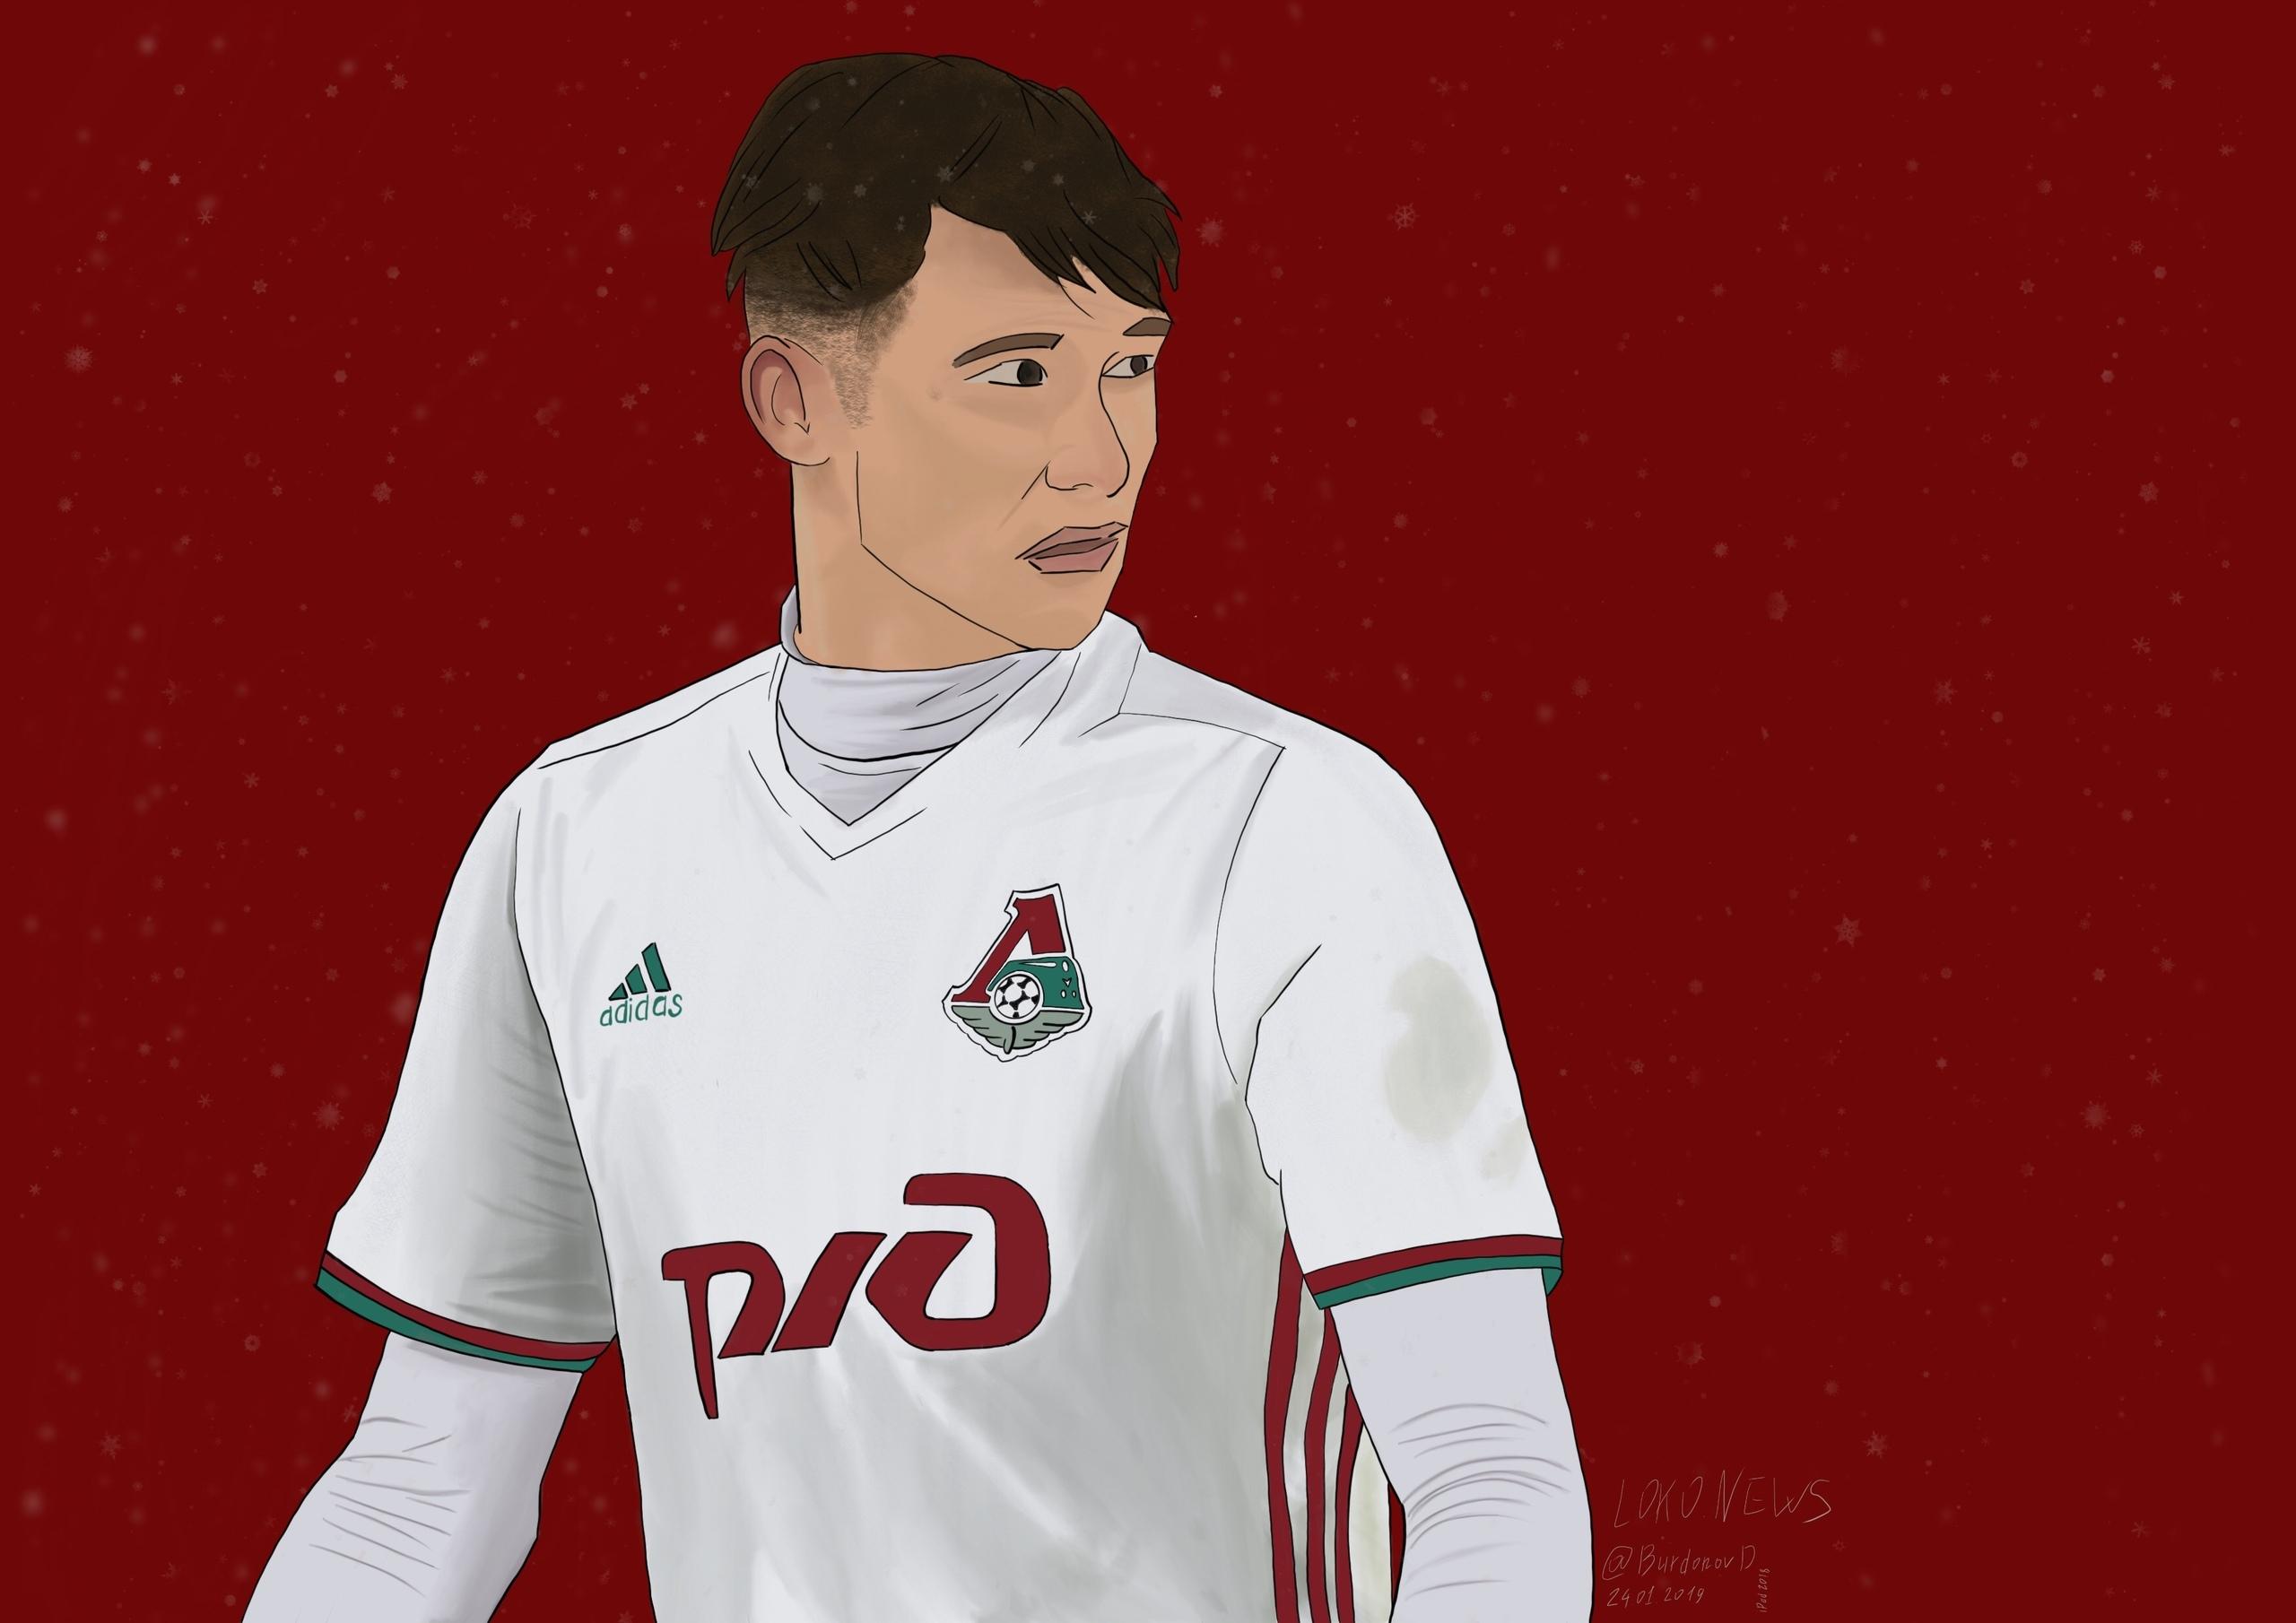 Алексей Миранчук. Рисунок: Дмитрий Бурдонов